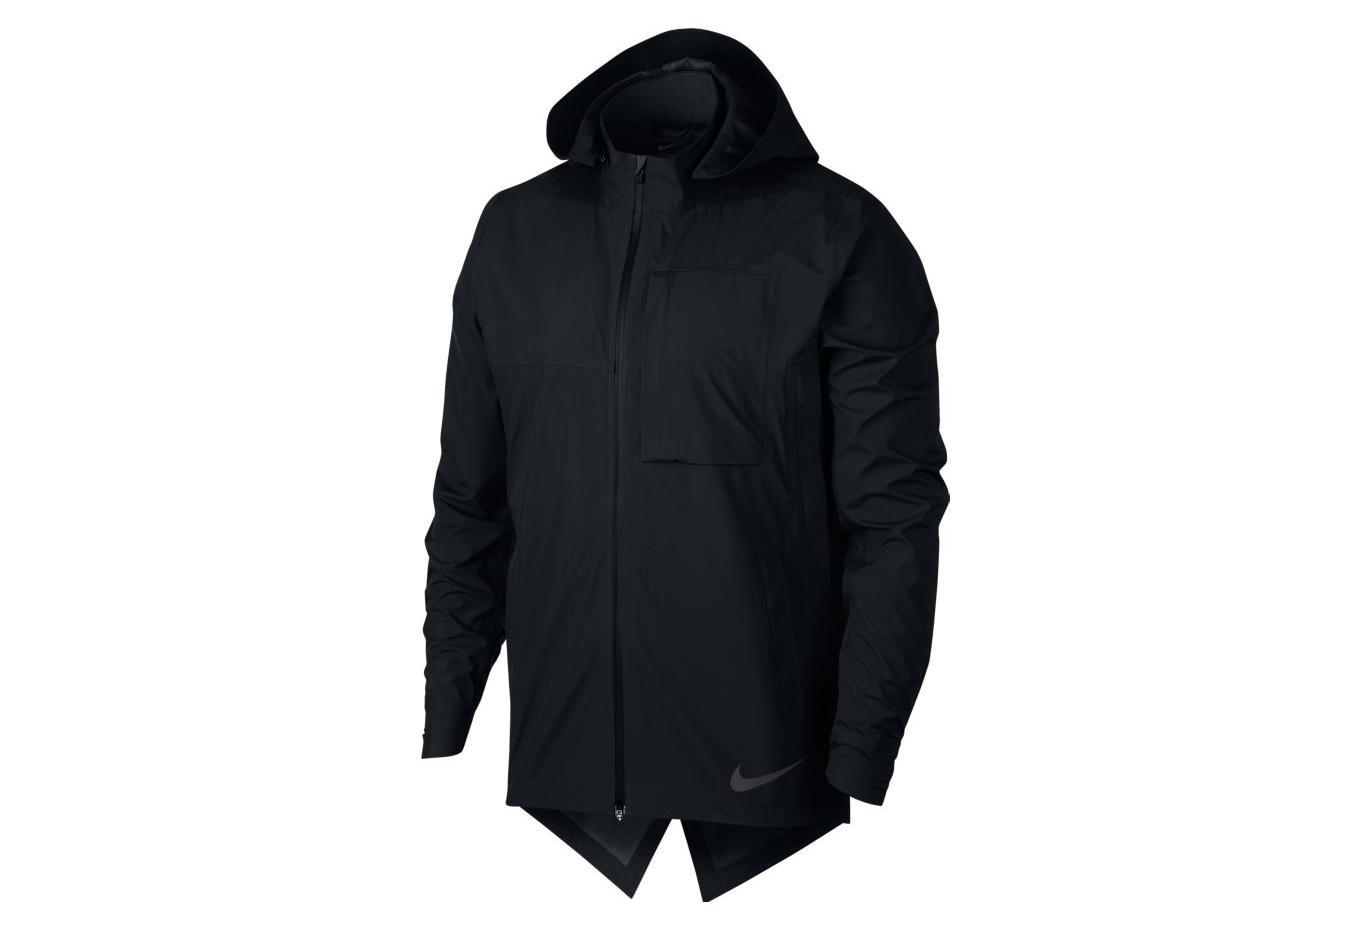 39d259e54a8b Nike Aeroshield Waterproof Jacket Black